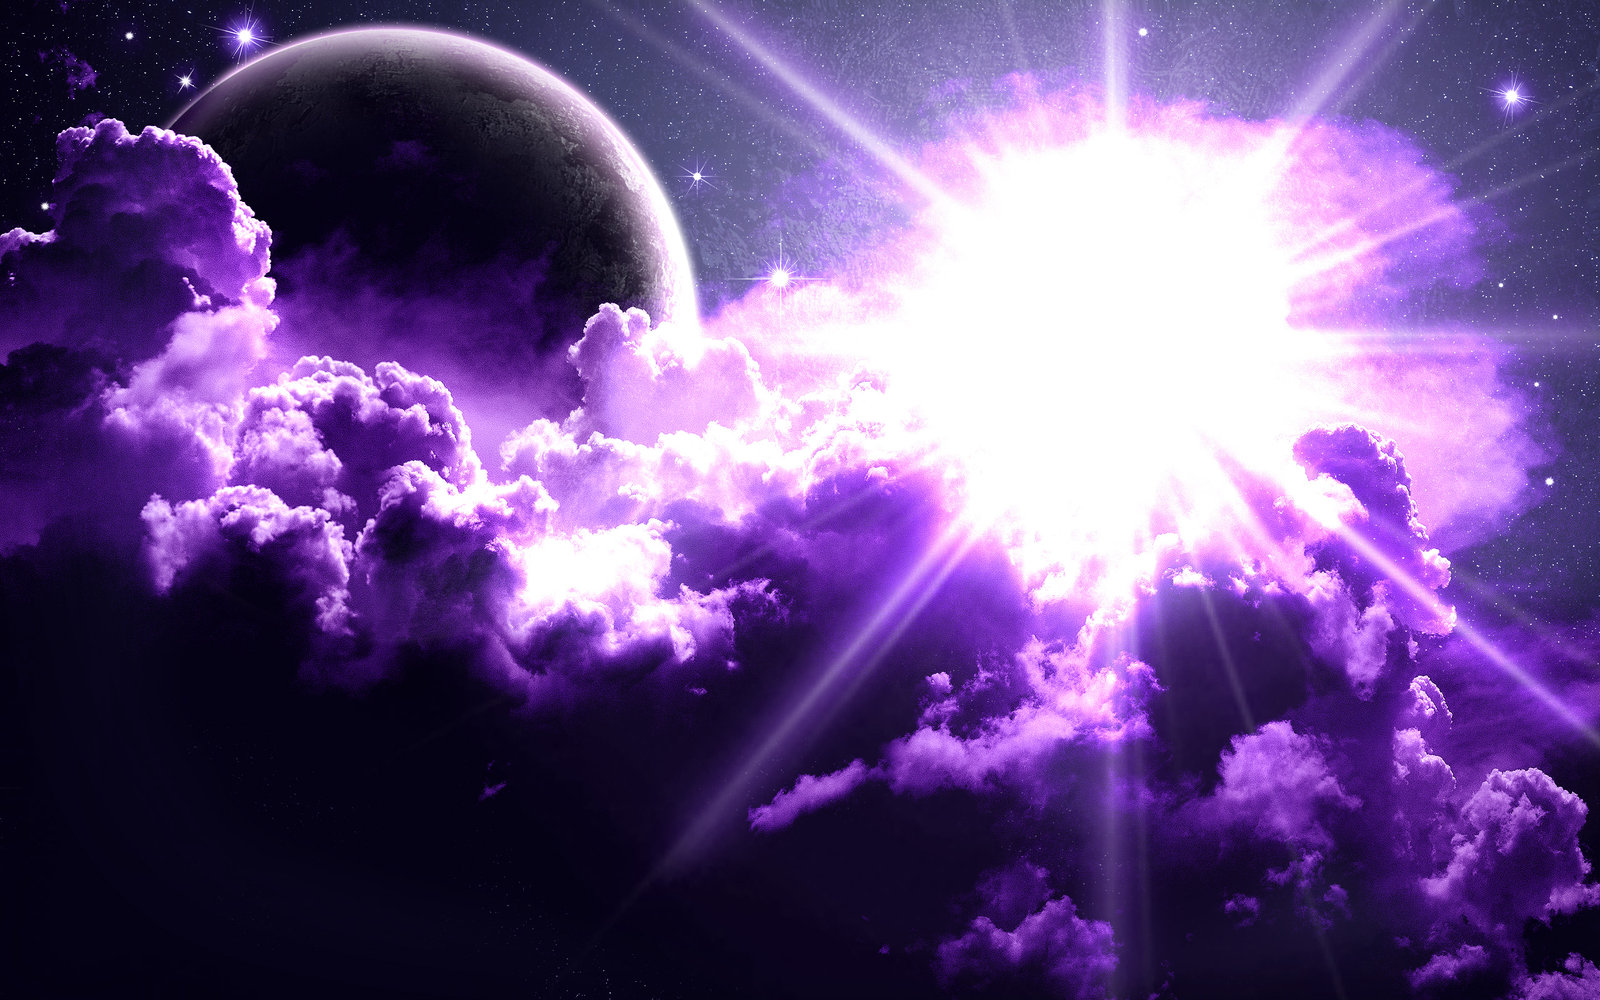 6c632c8d9 Cool Purple Backgrounds hd HD wallpaper background 1600x1000